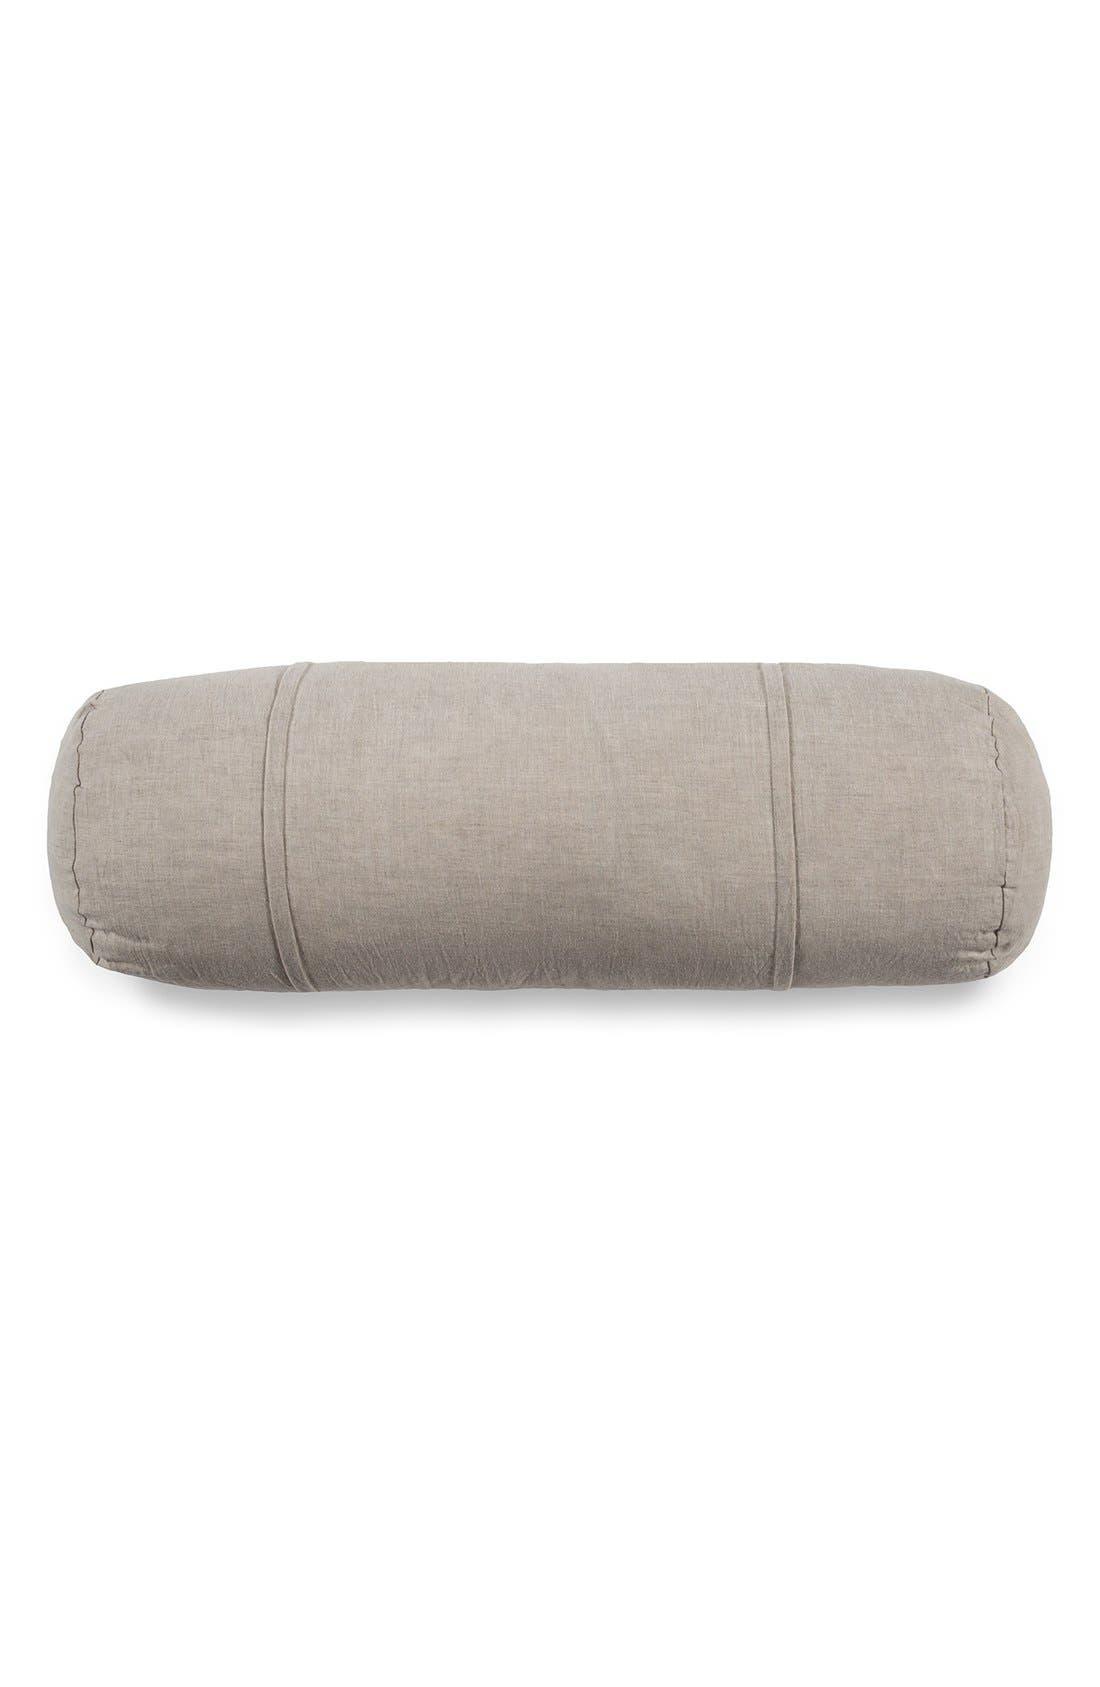 PomPomat Home 'Louwie' Bolster Pillow,                             Main thumbnail 1, color,                             281